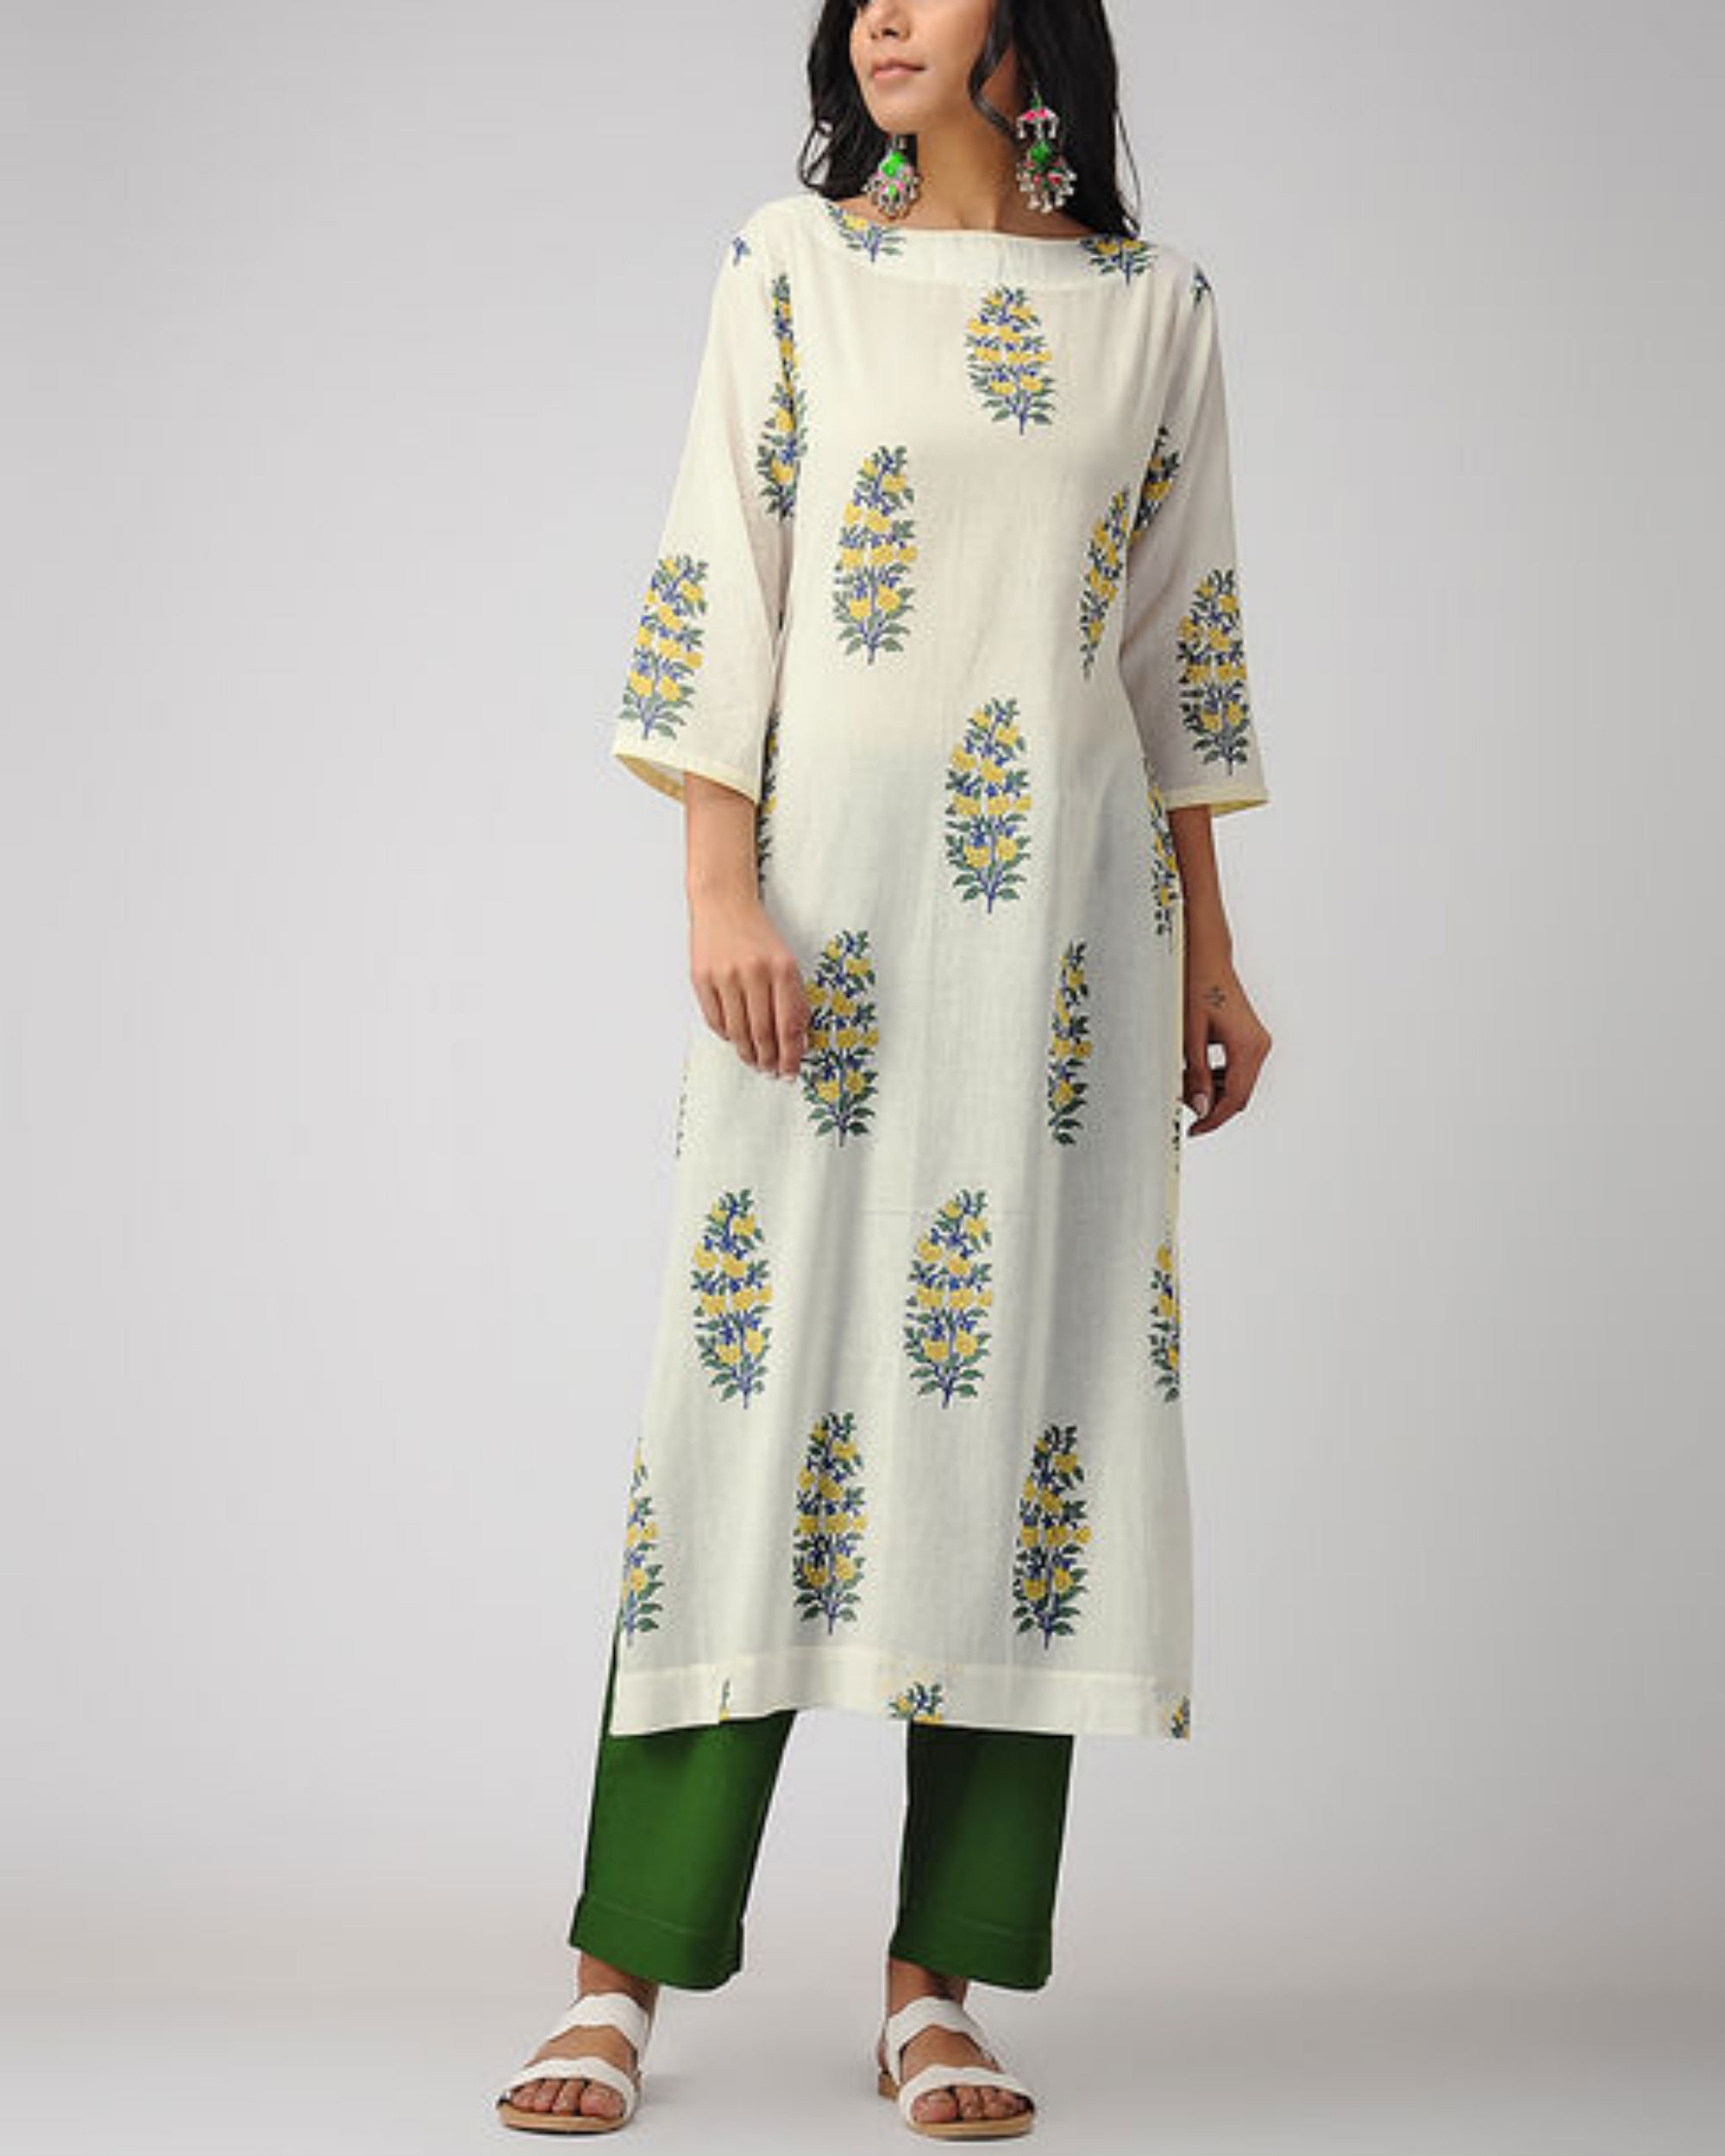 Ivory printed kurta